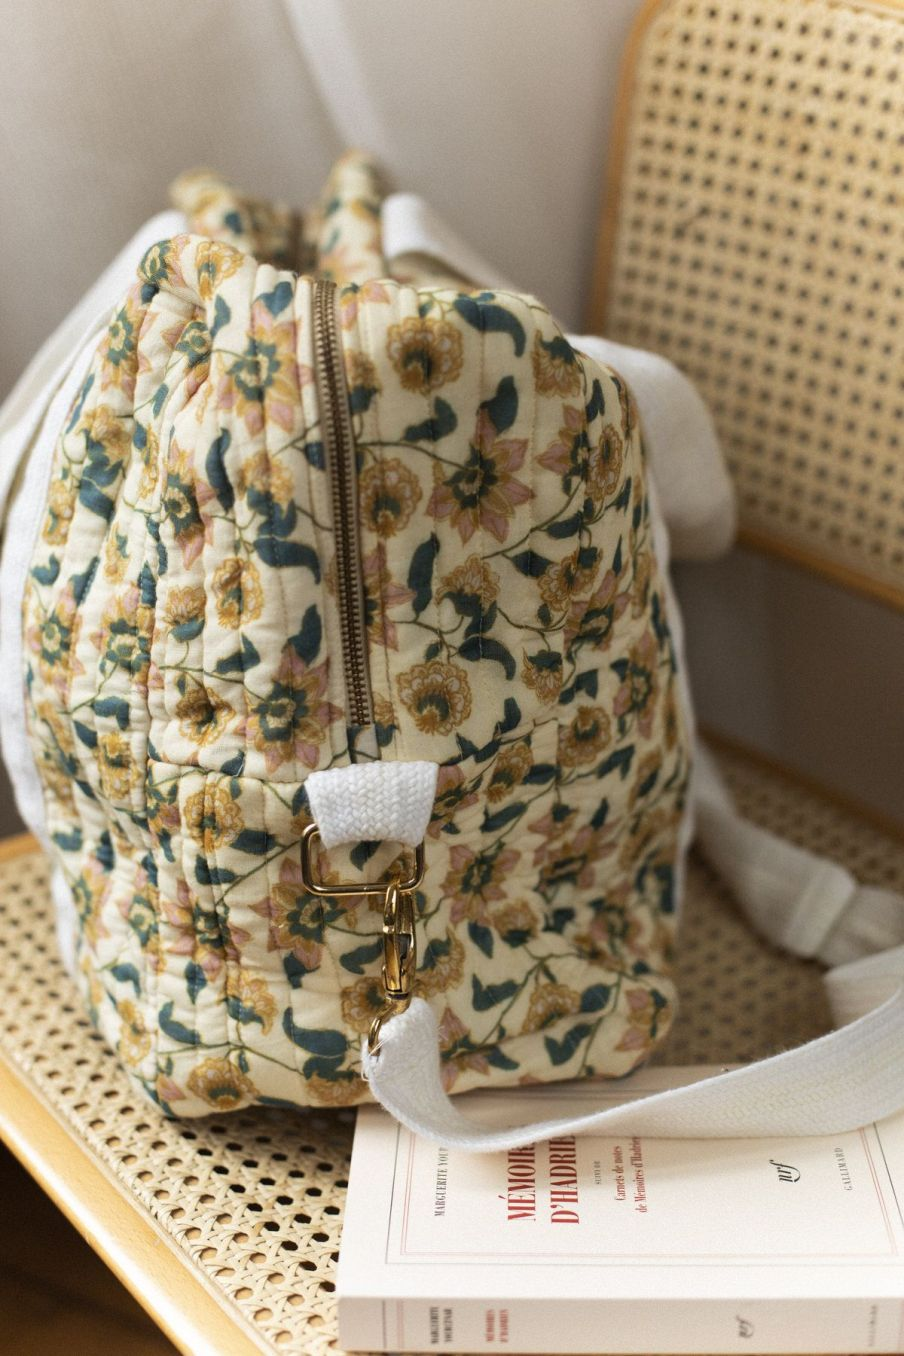 boheme chic vintage sac 48heures maison lilio cream flowers